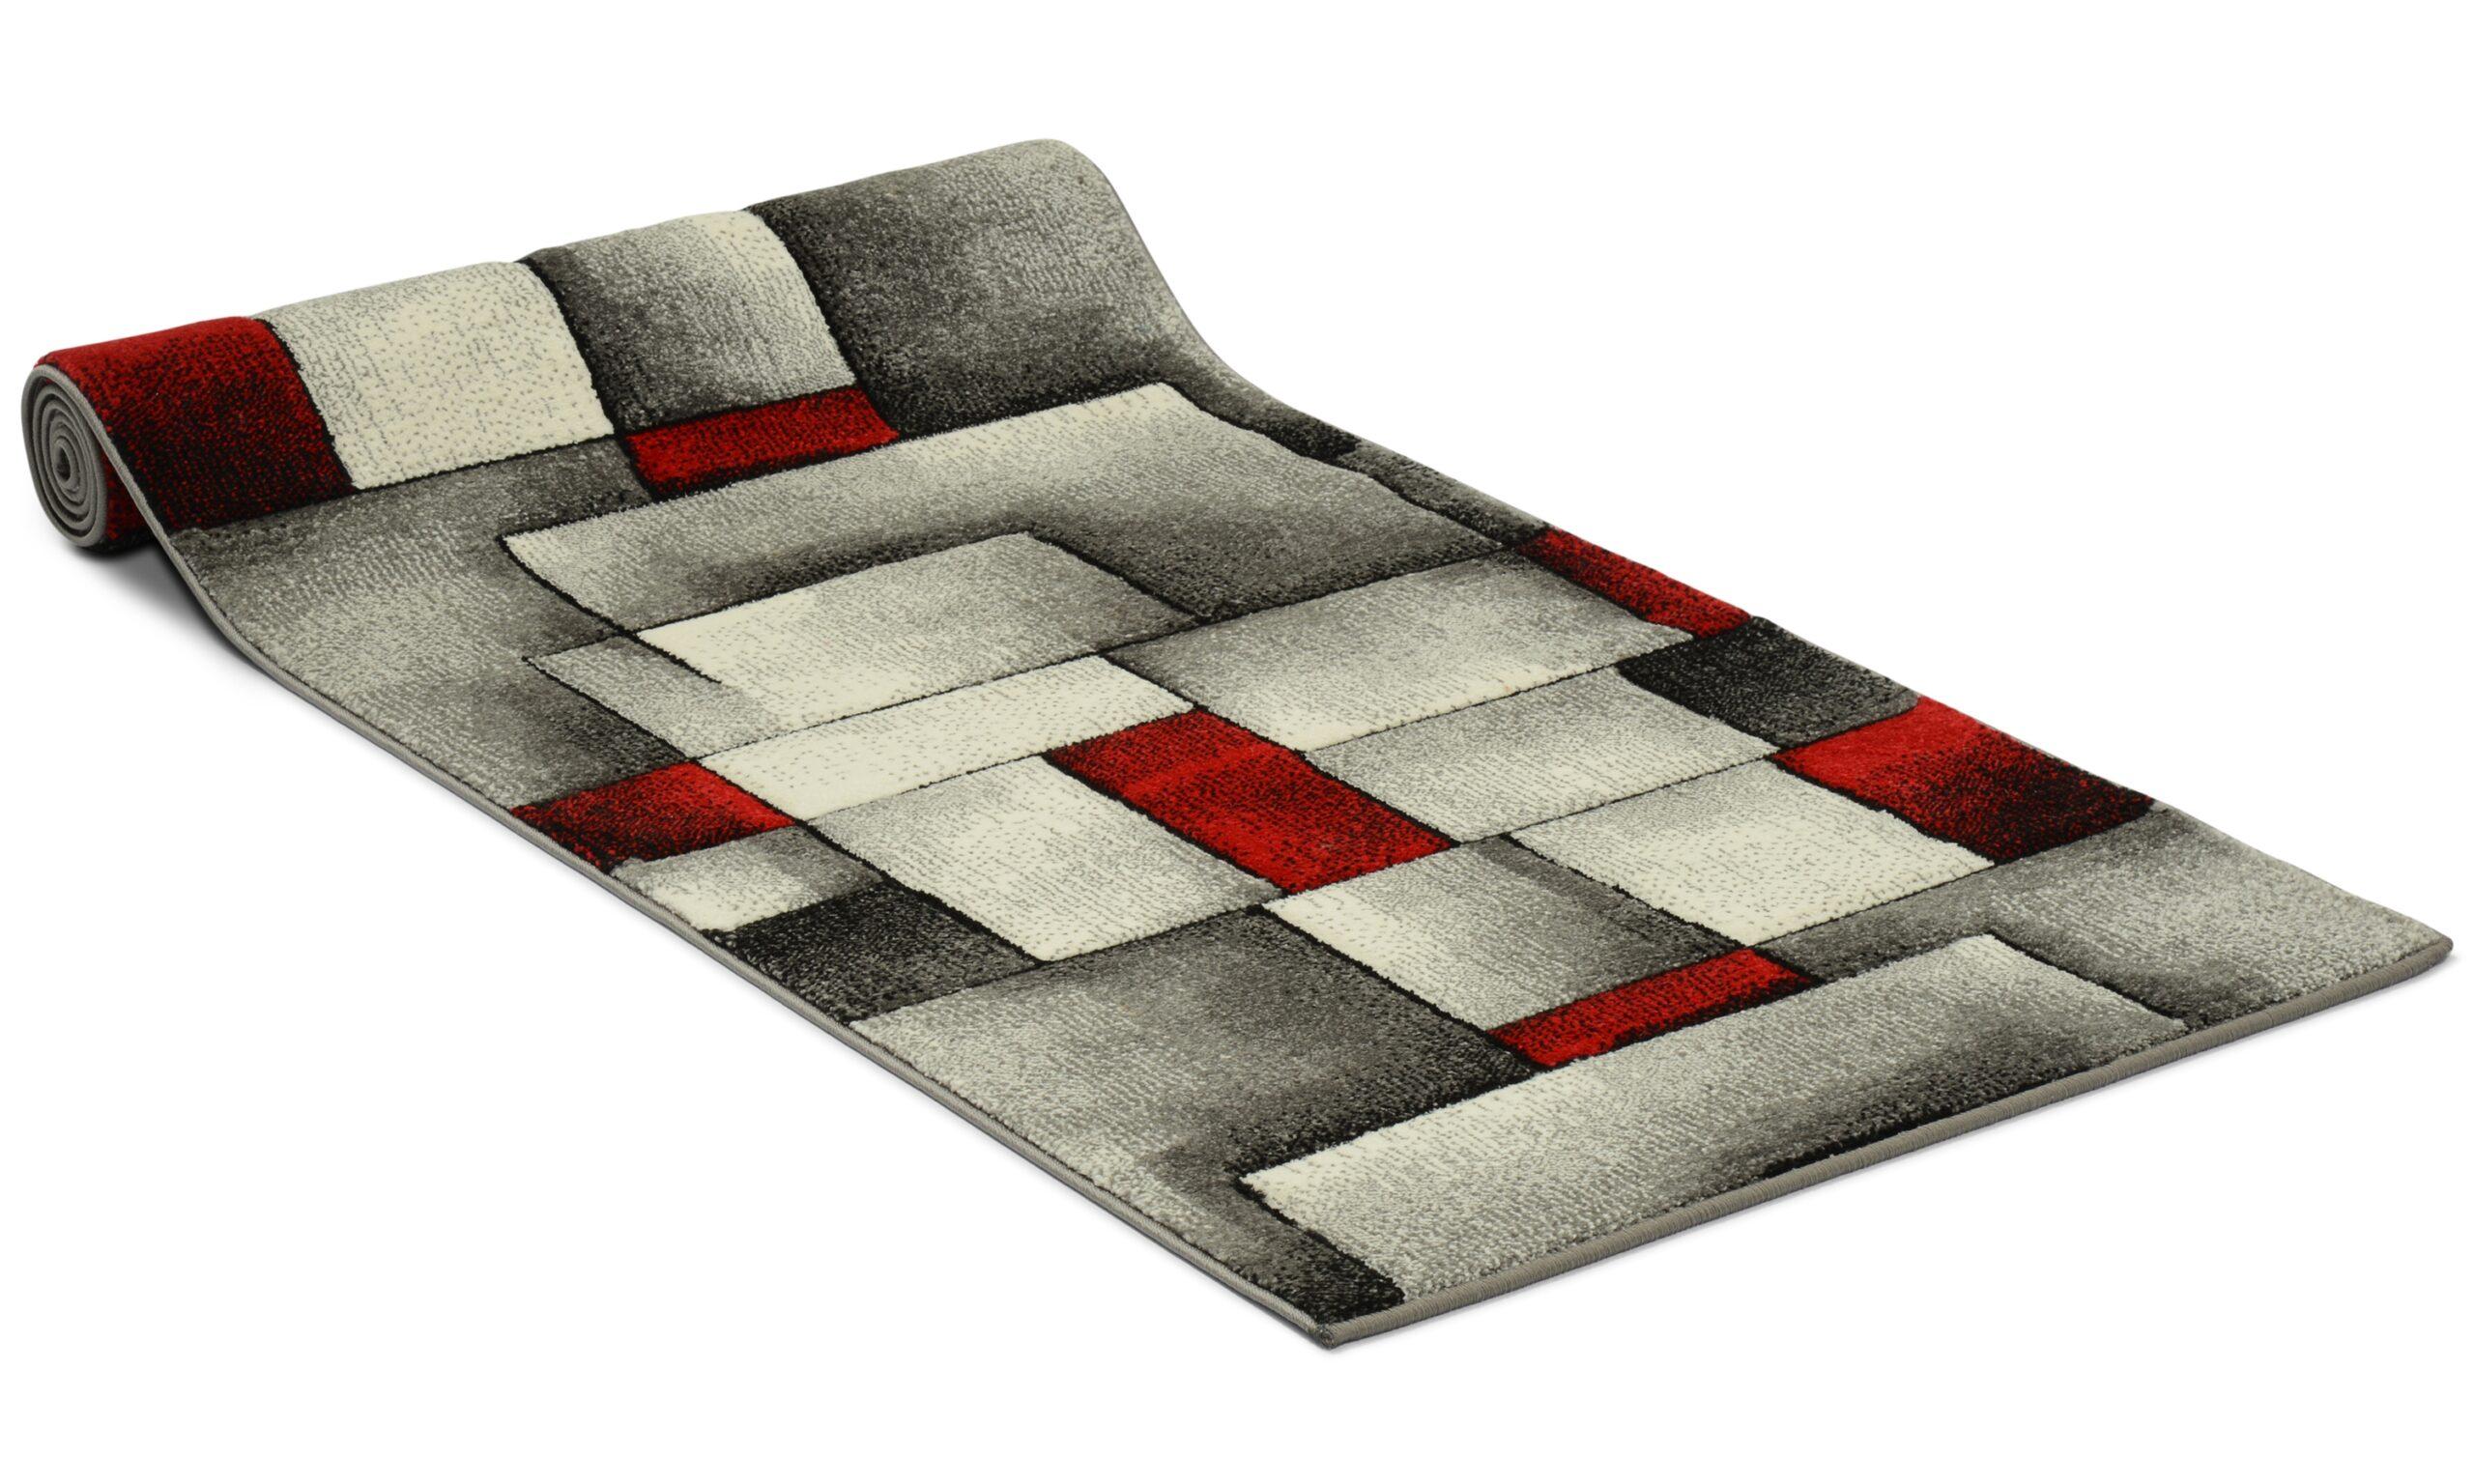 Brilliance grå/rød - dørmatte på metervare